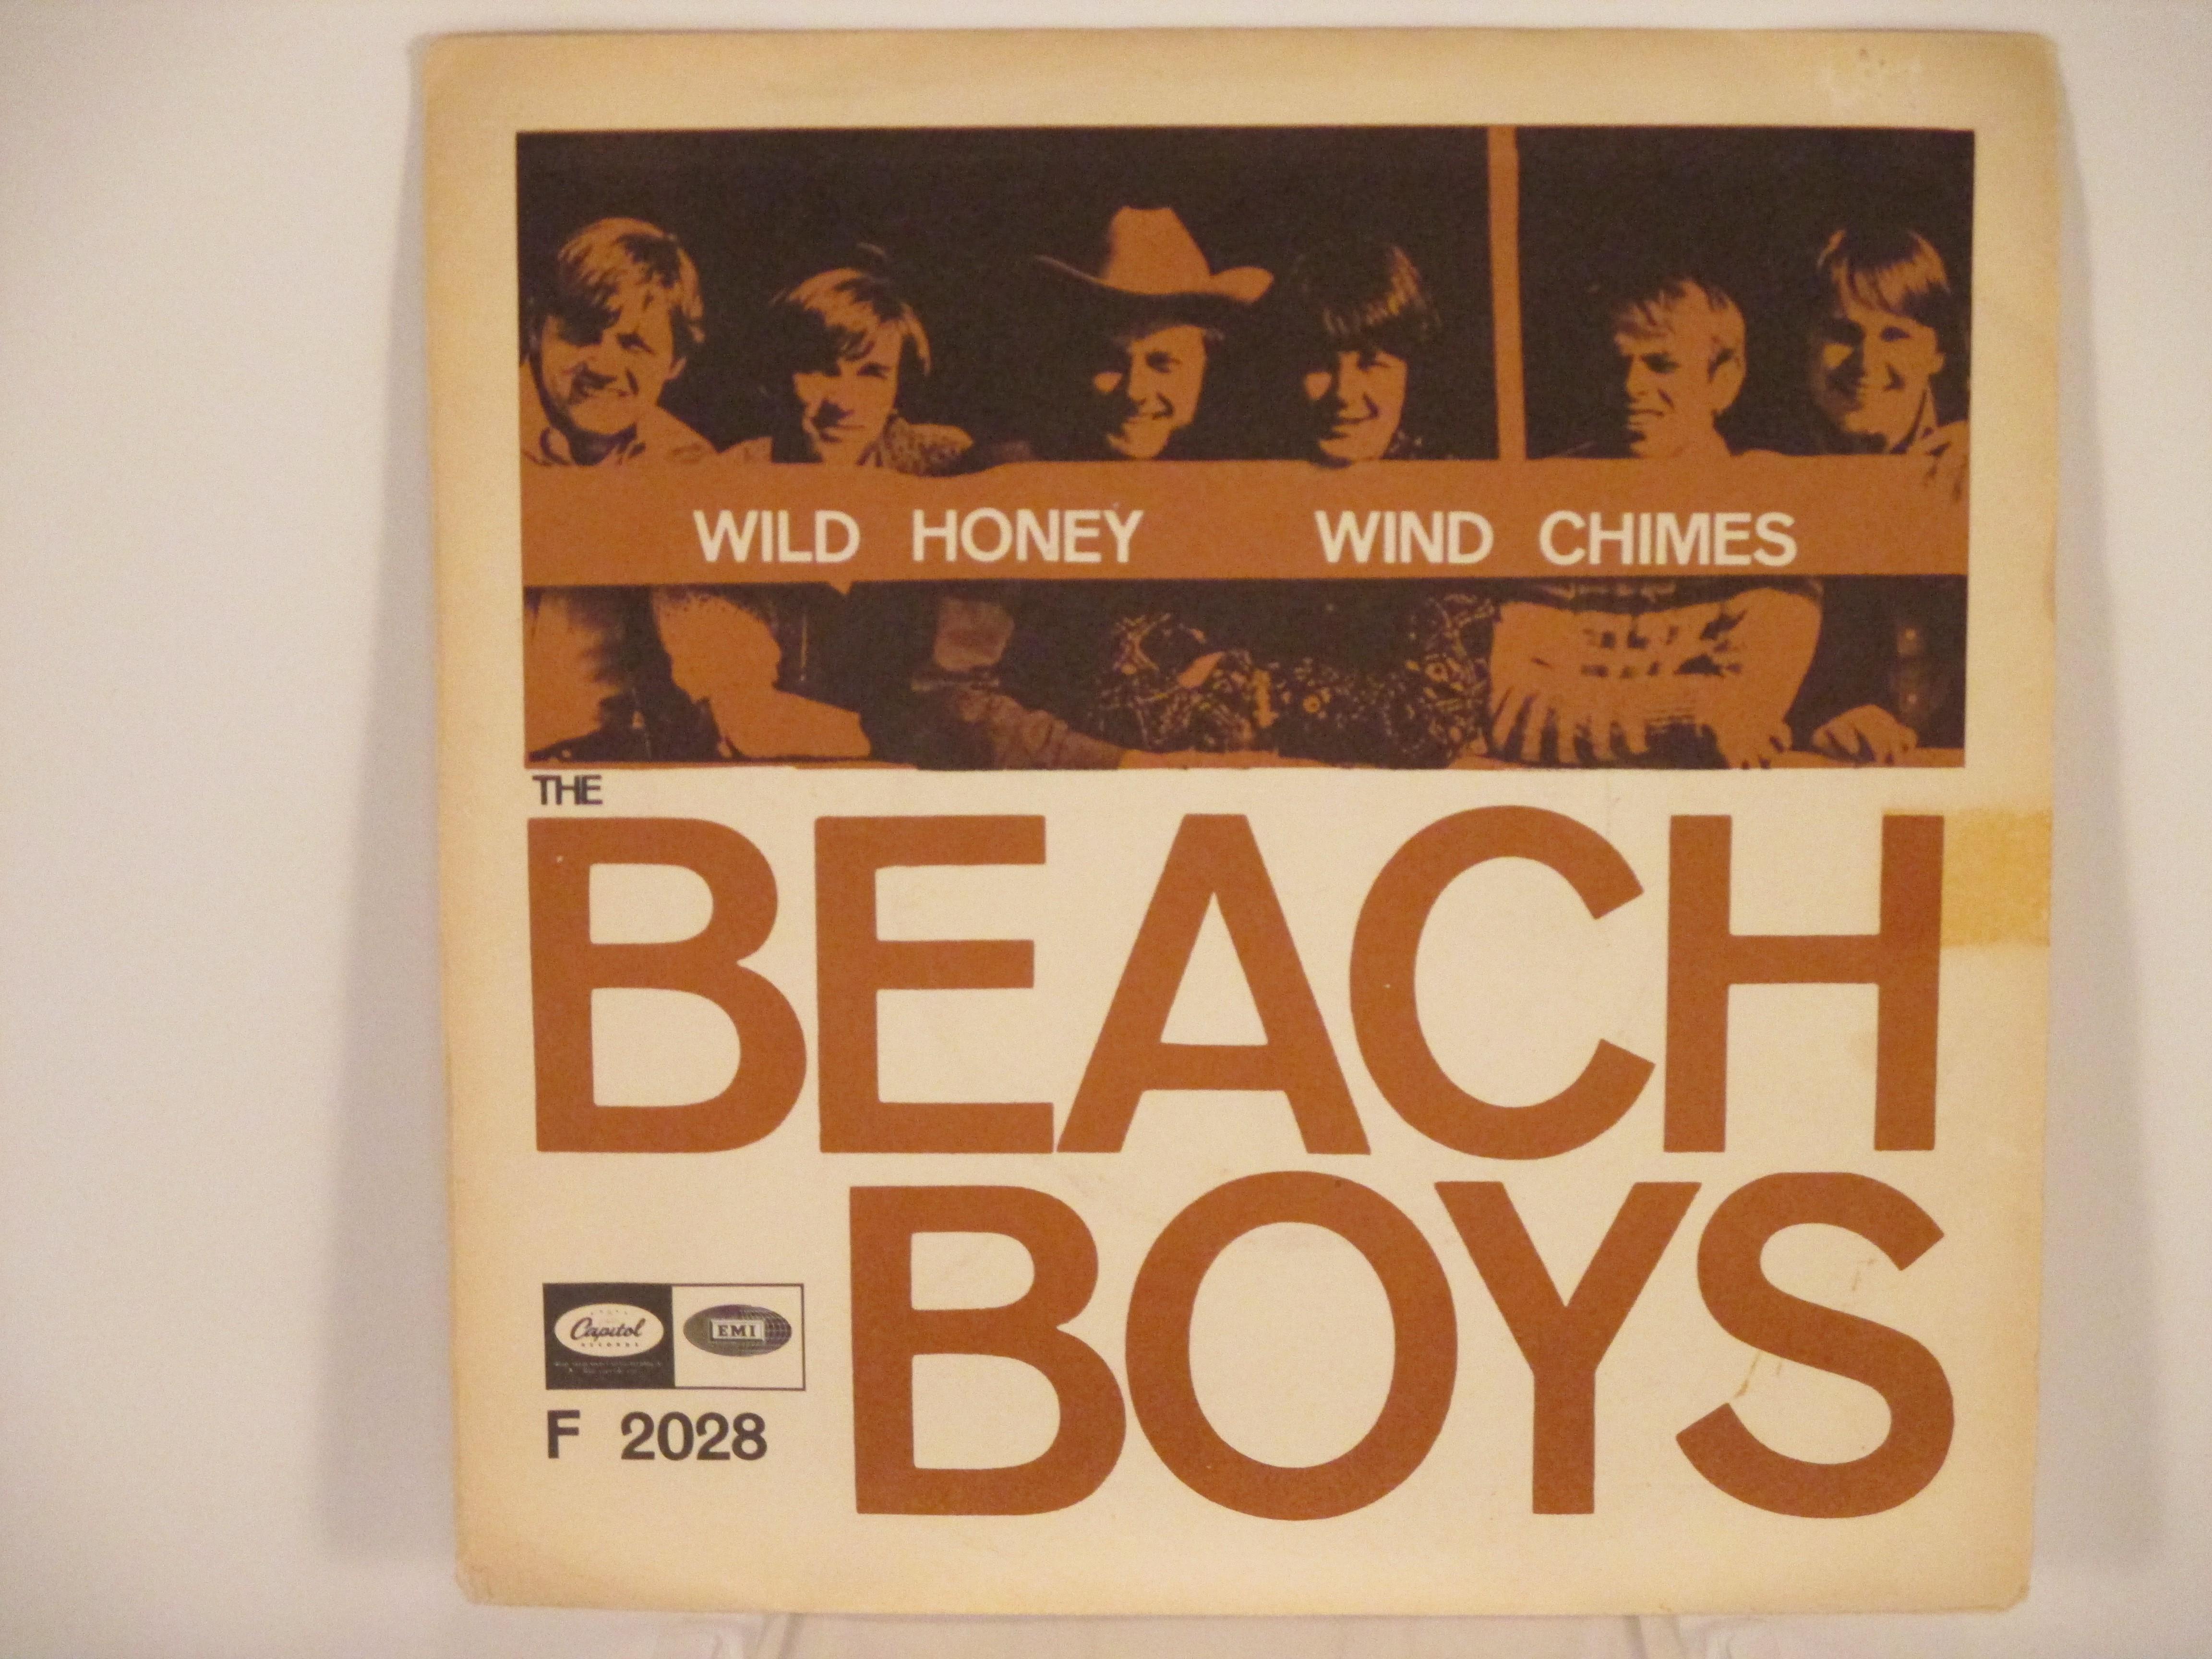 BEACH BOYS : Wild honey / Wind chimes